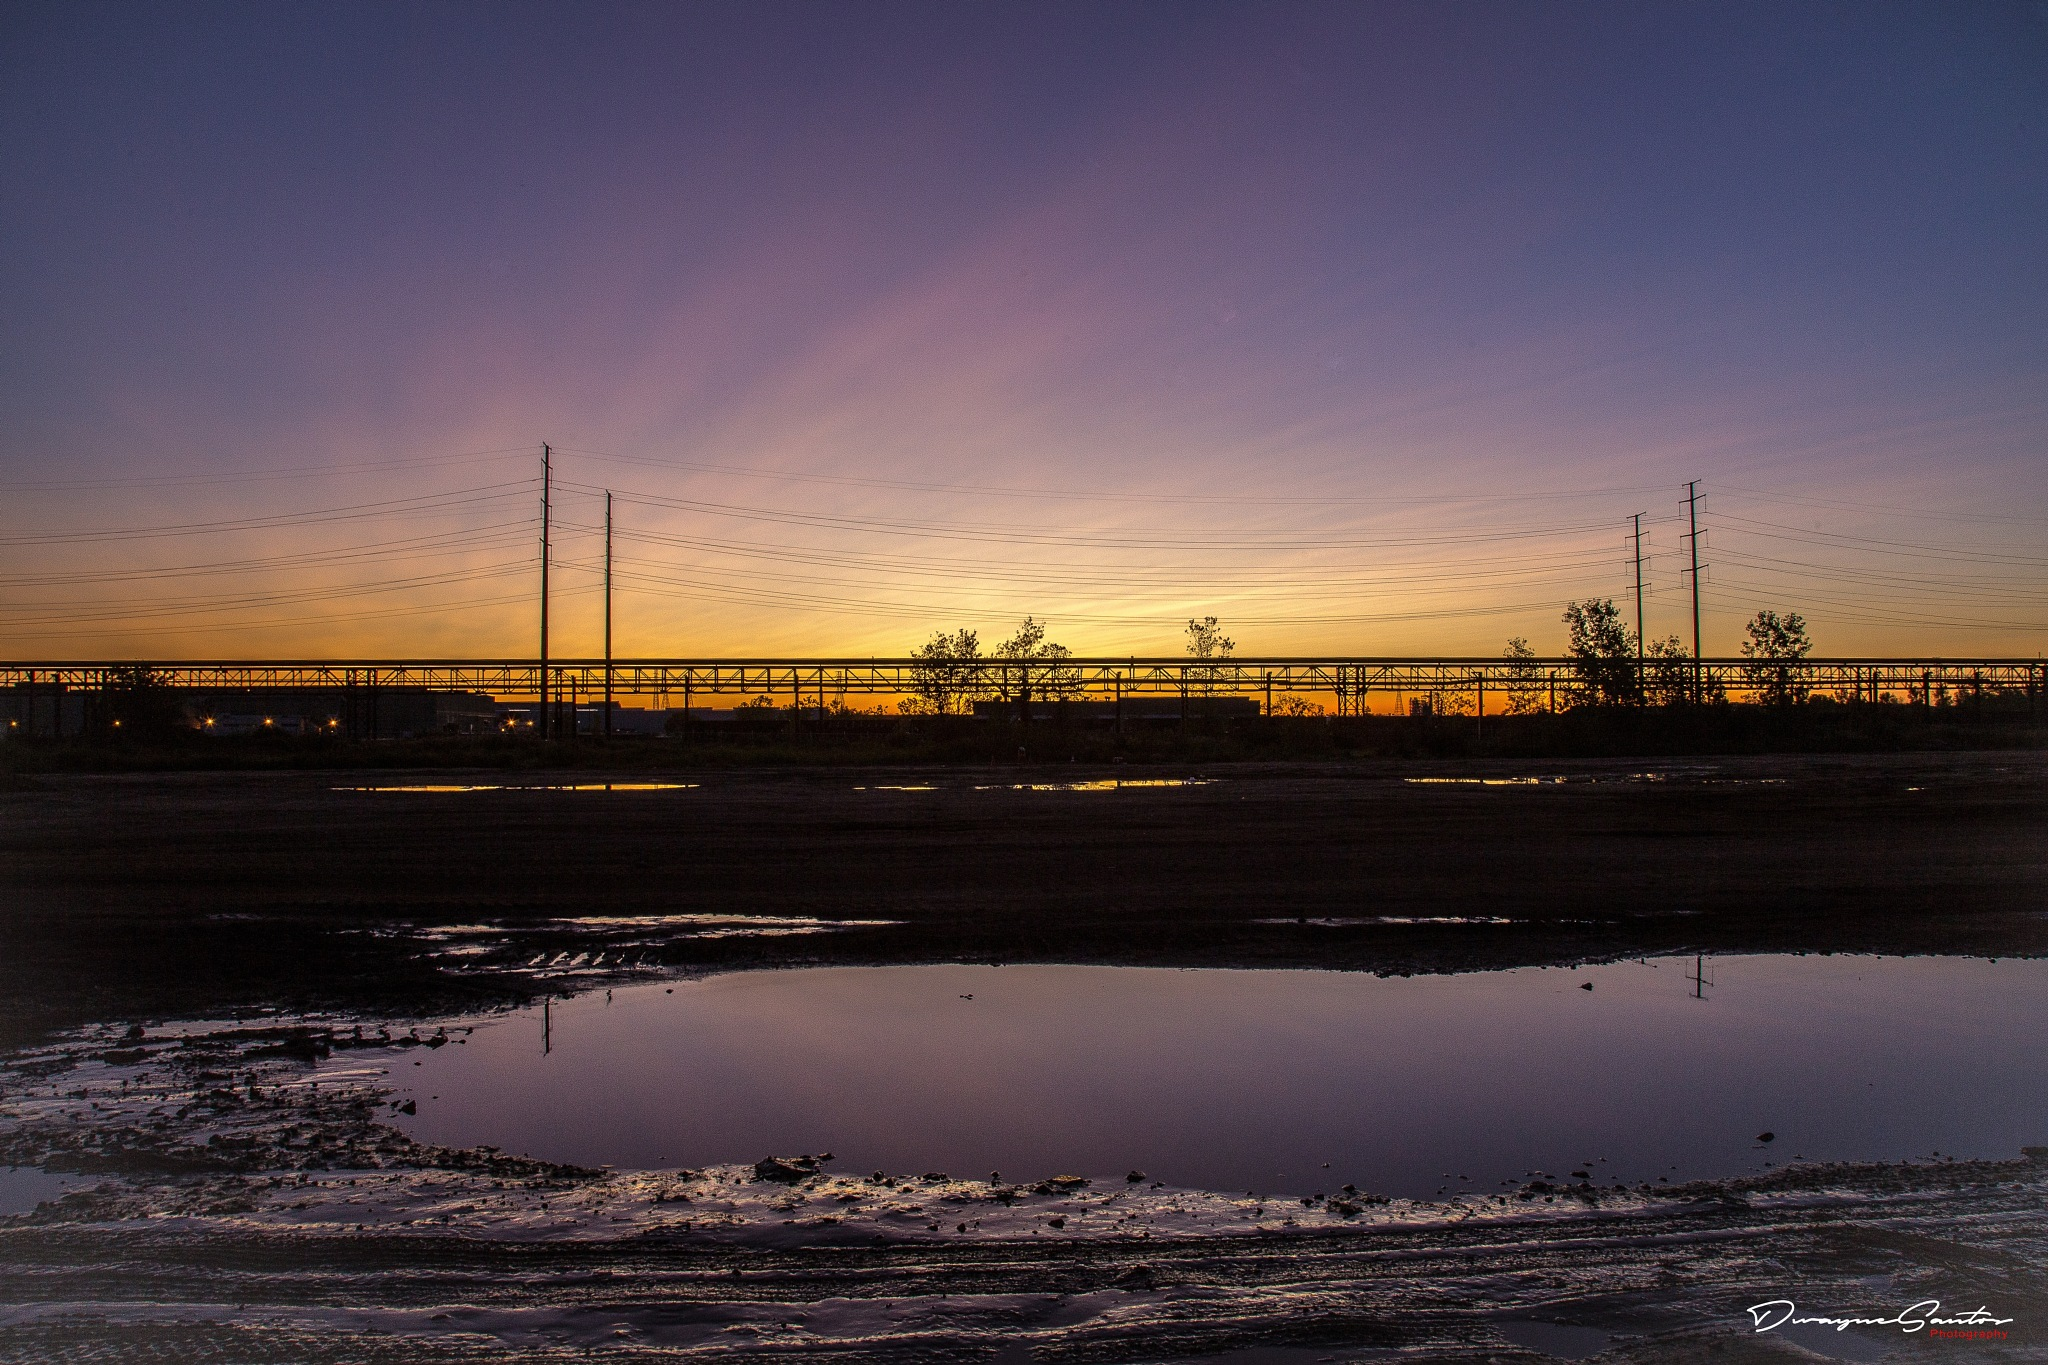 Sun Rise by Dwayne Santos